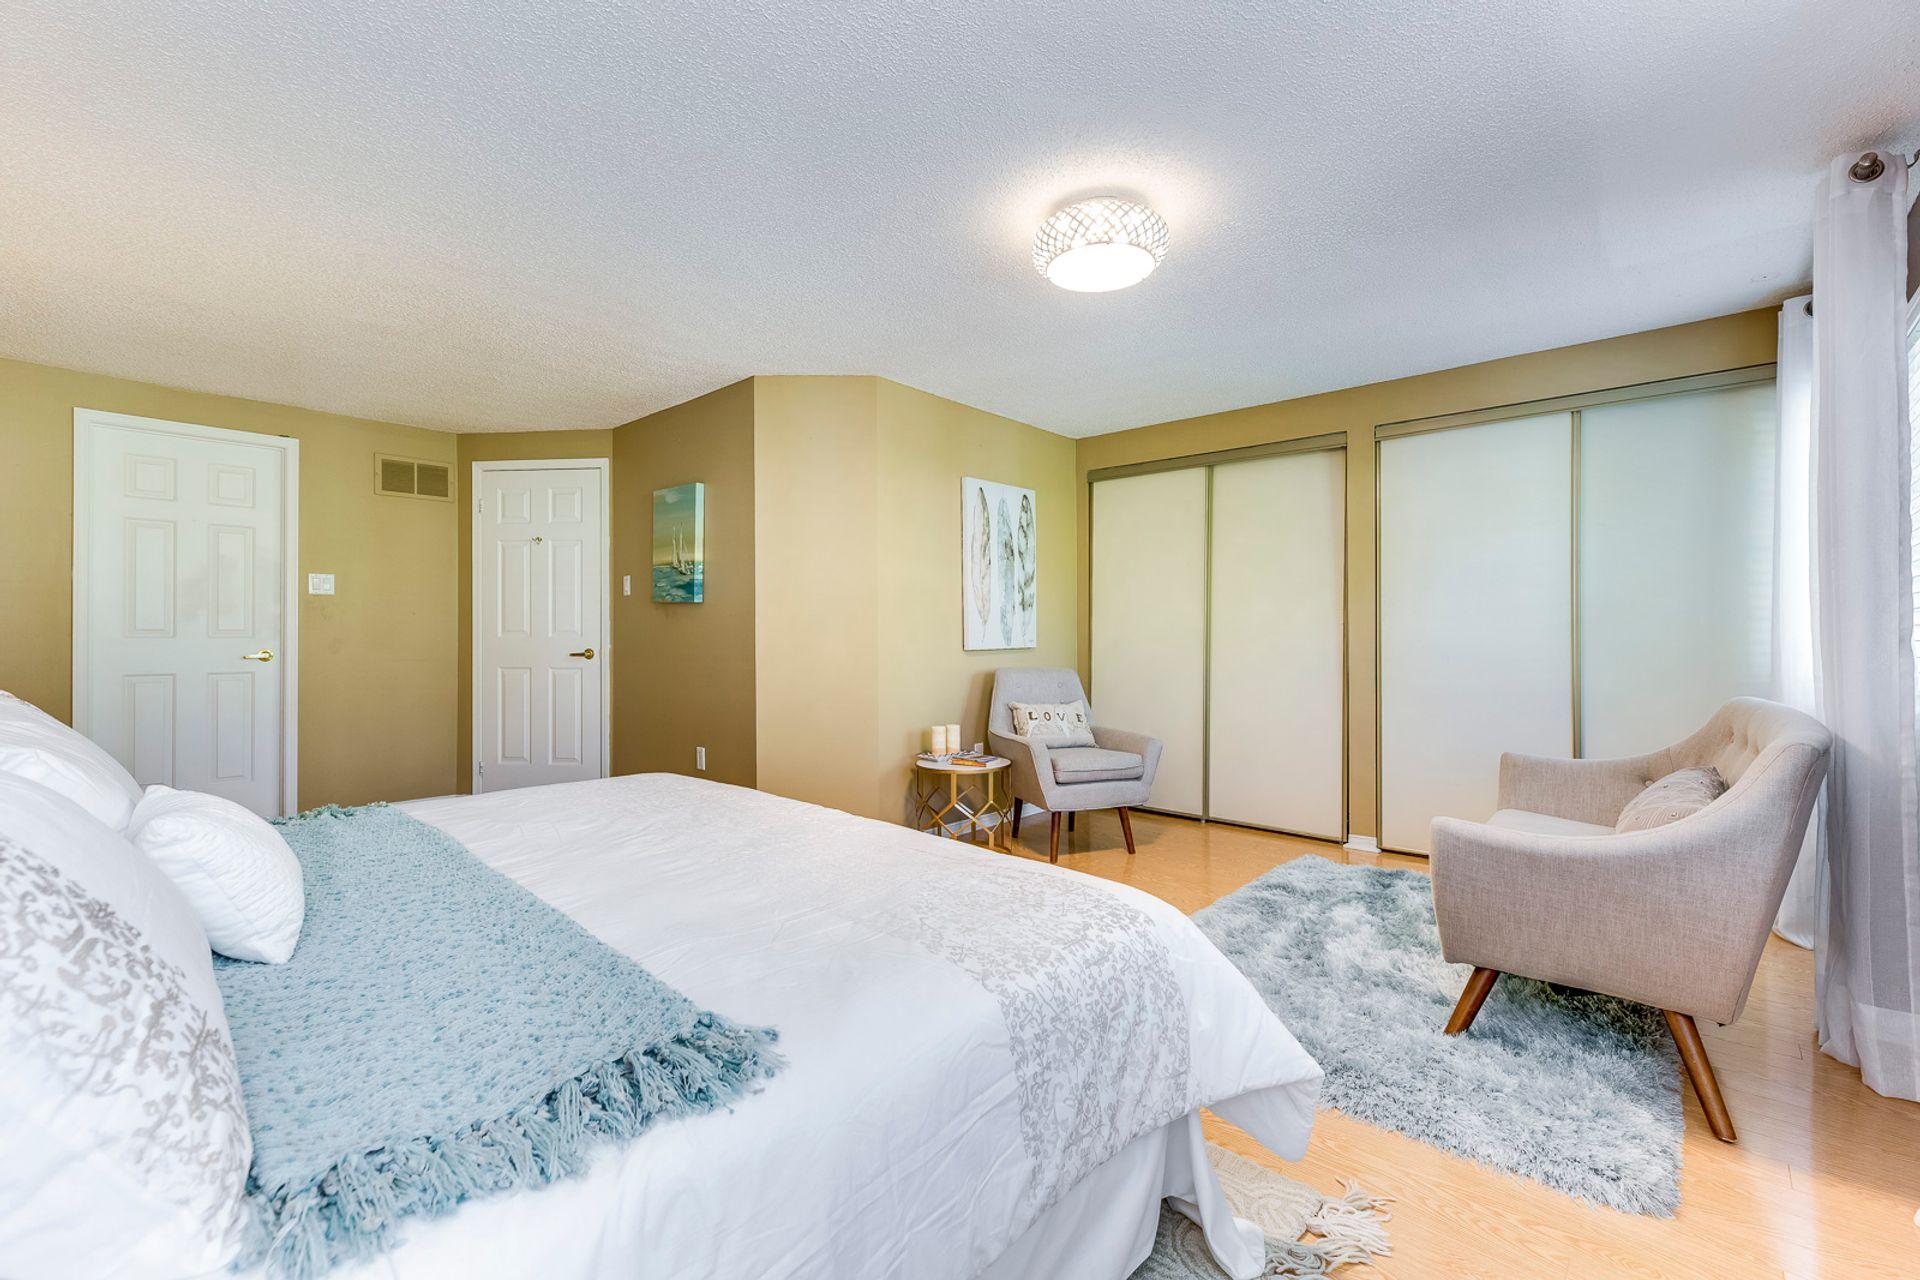 Primary Bedroom - 33 - 4605 Donegal Dr, Mississauga - Elite3 & Team at 33 - 4605 Donegal Drive, Erin Mills, Mississauga